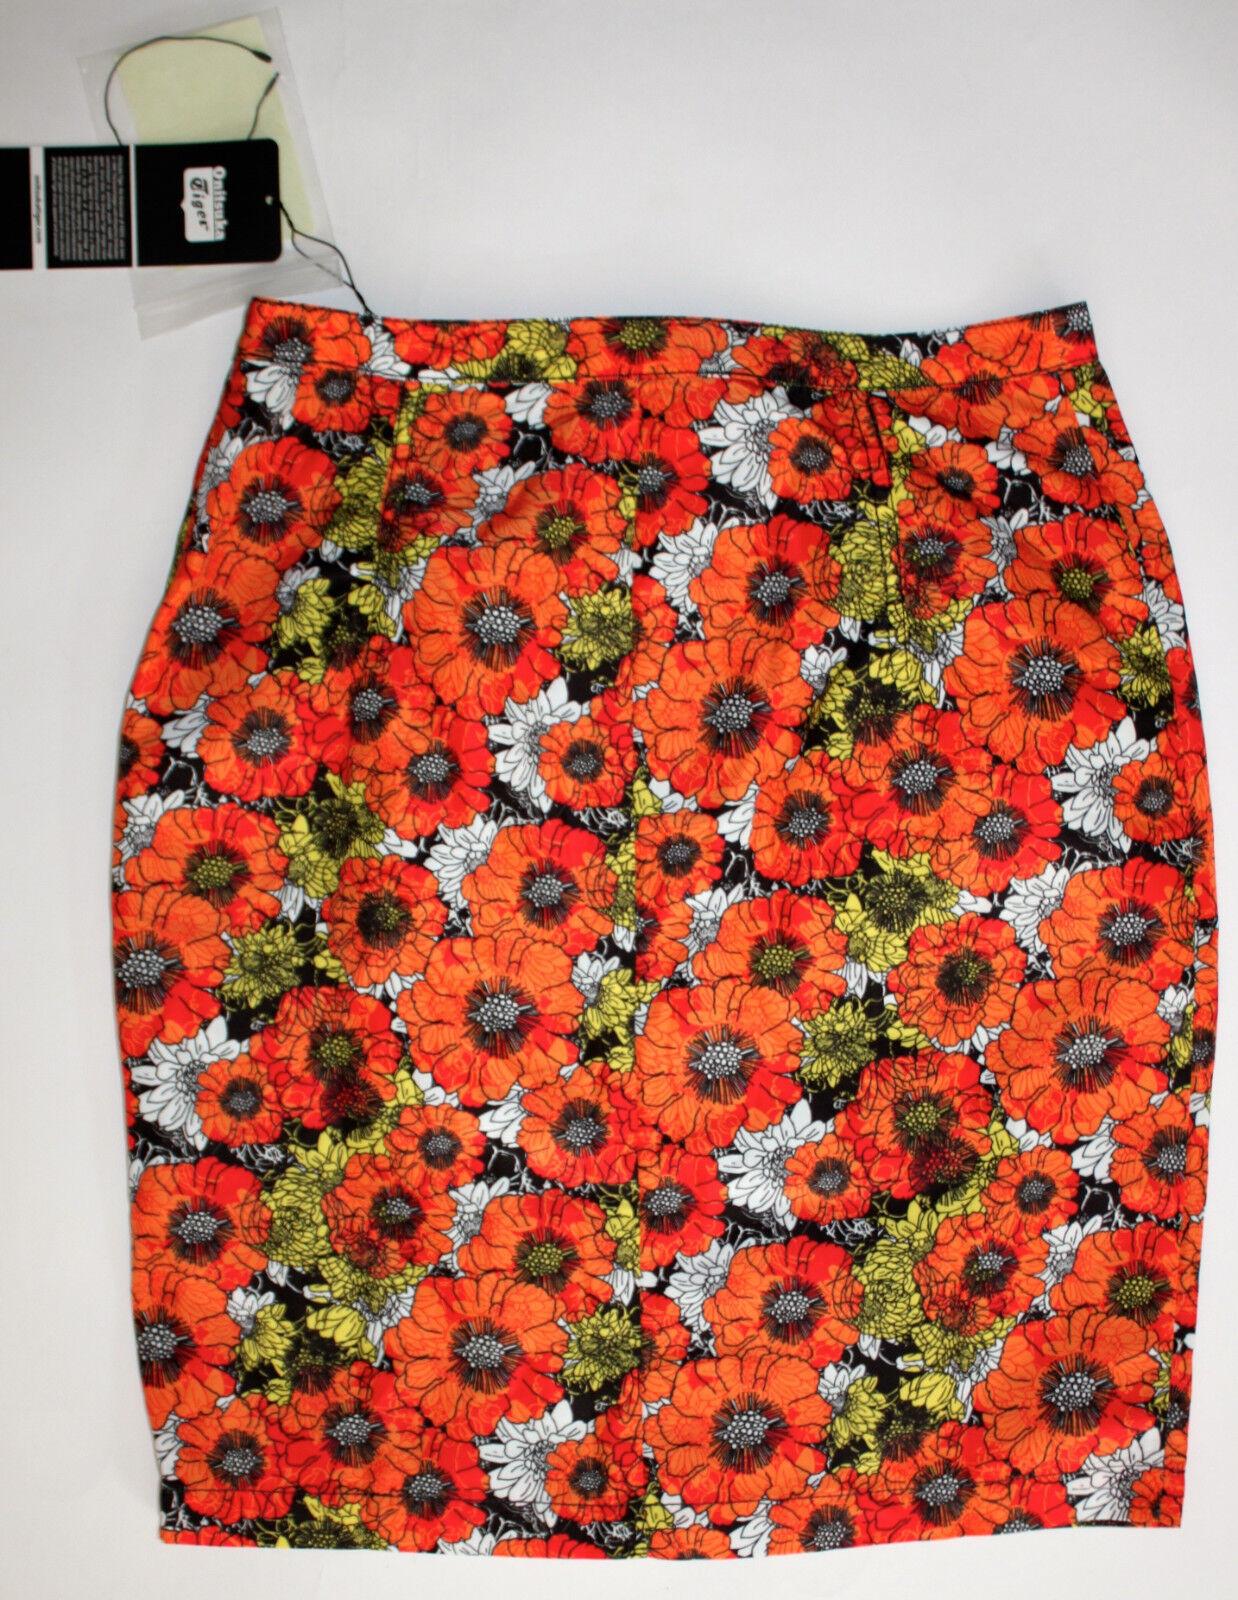 Asics Onitsuka Tiger Women's XS orange White Floral Retro Skirt New Unique